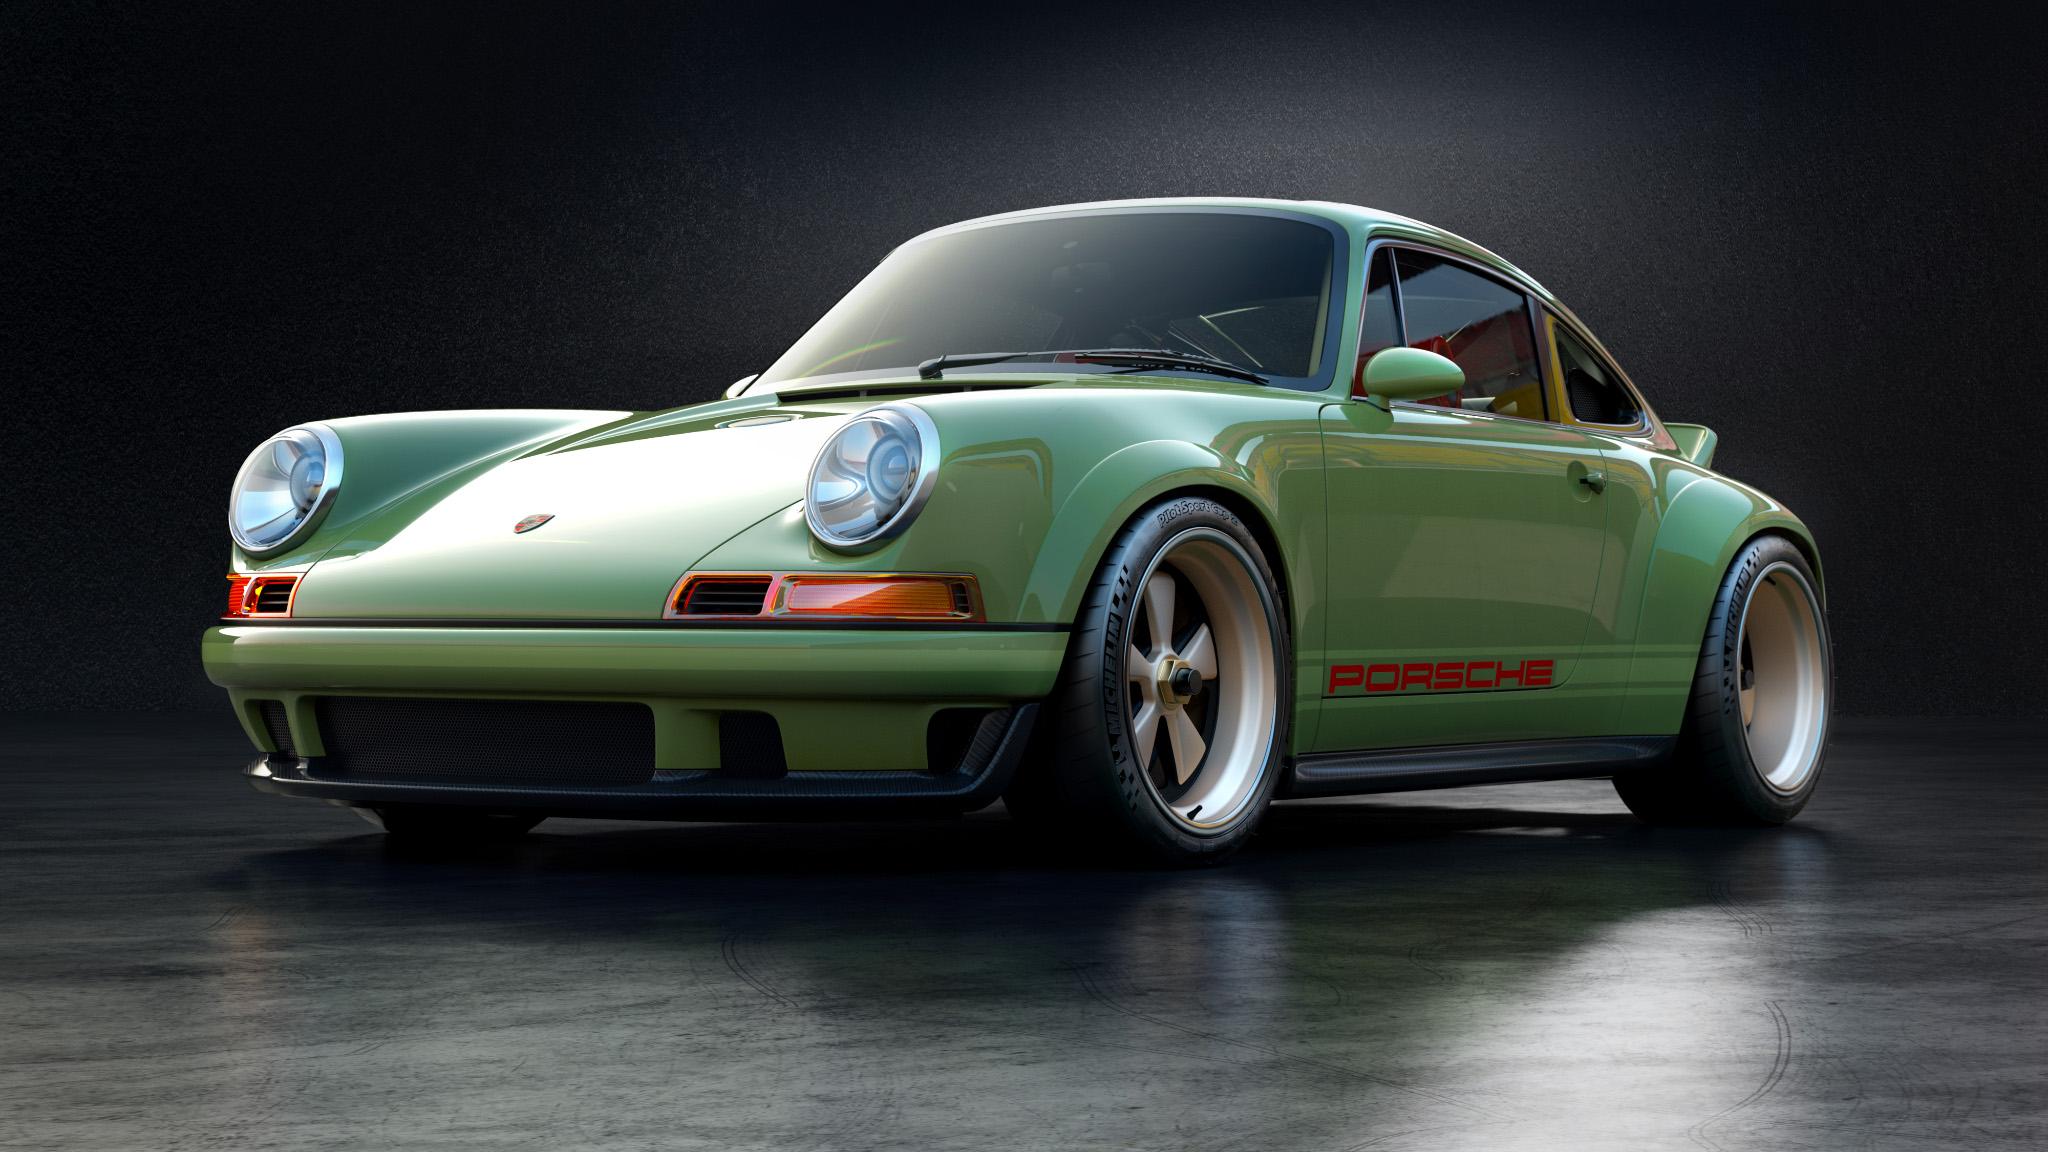 1990 Porsche  911 front left 3/4 shot